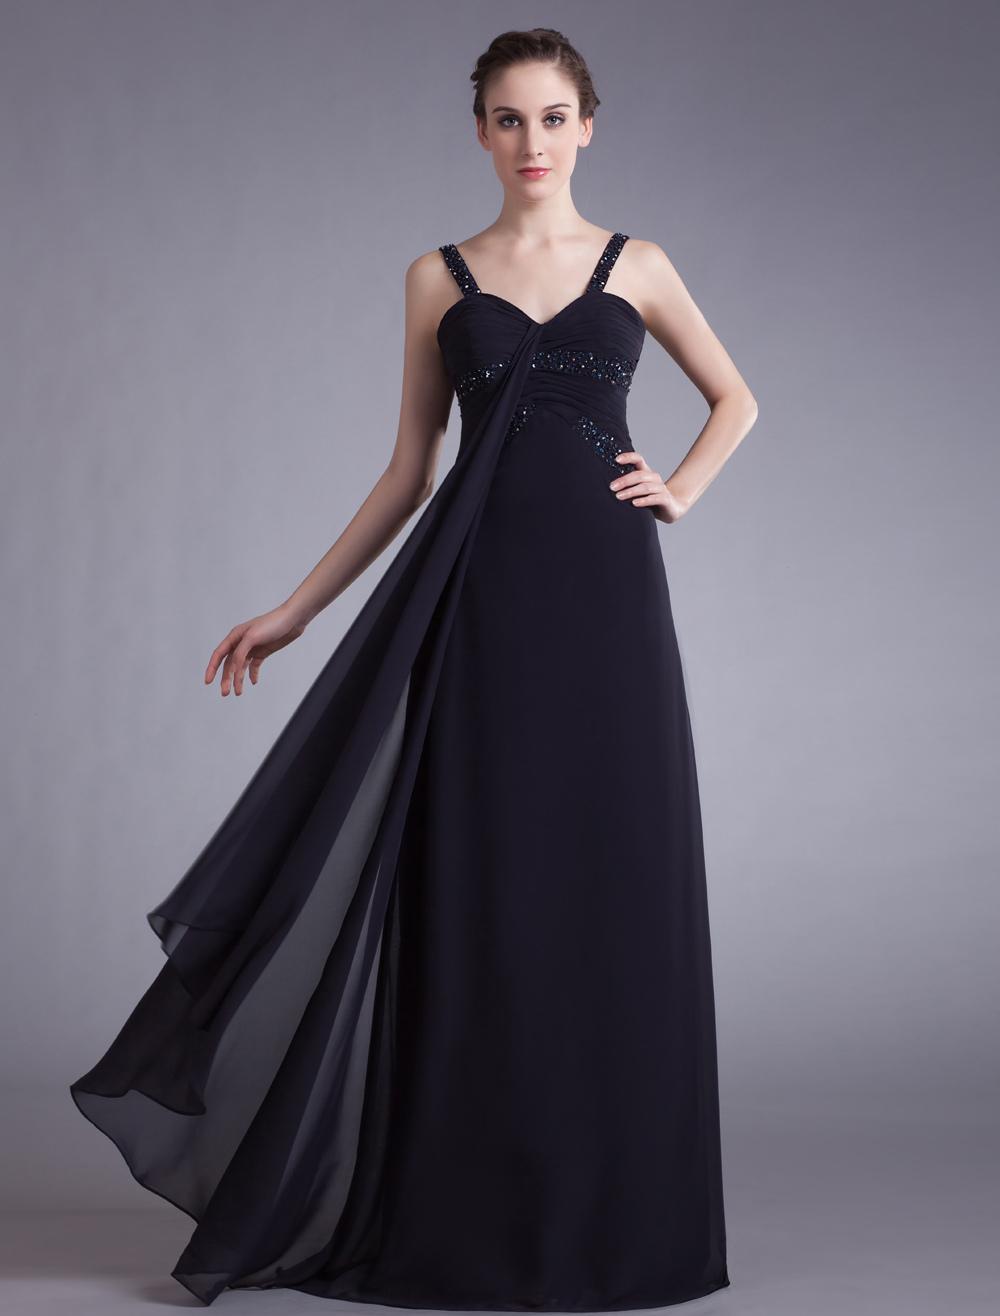 Navy Blue Long Evening Dress with Beads - Milanoo.com